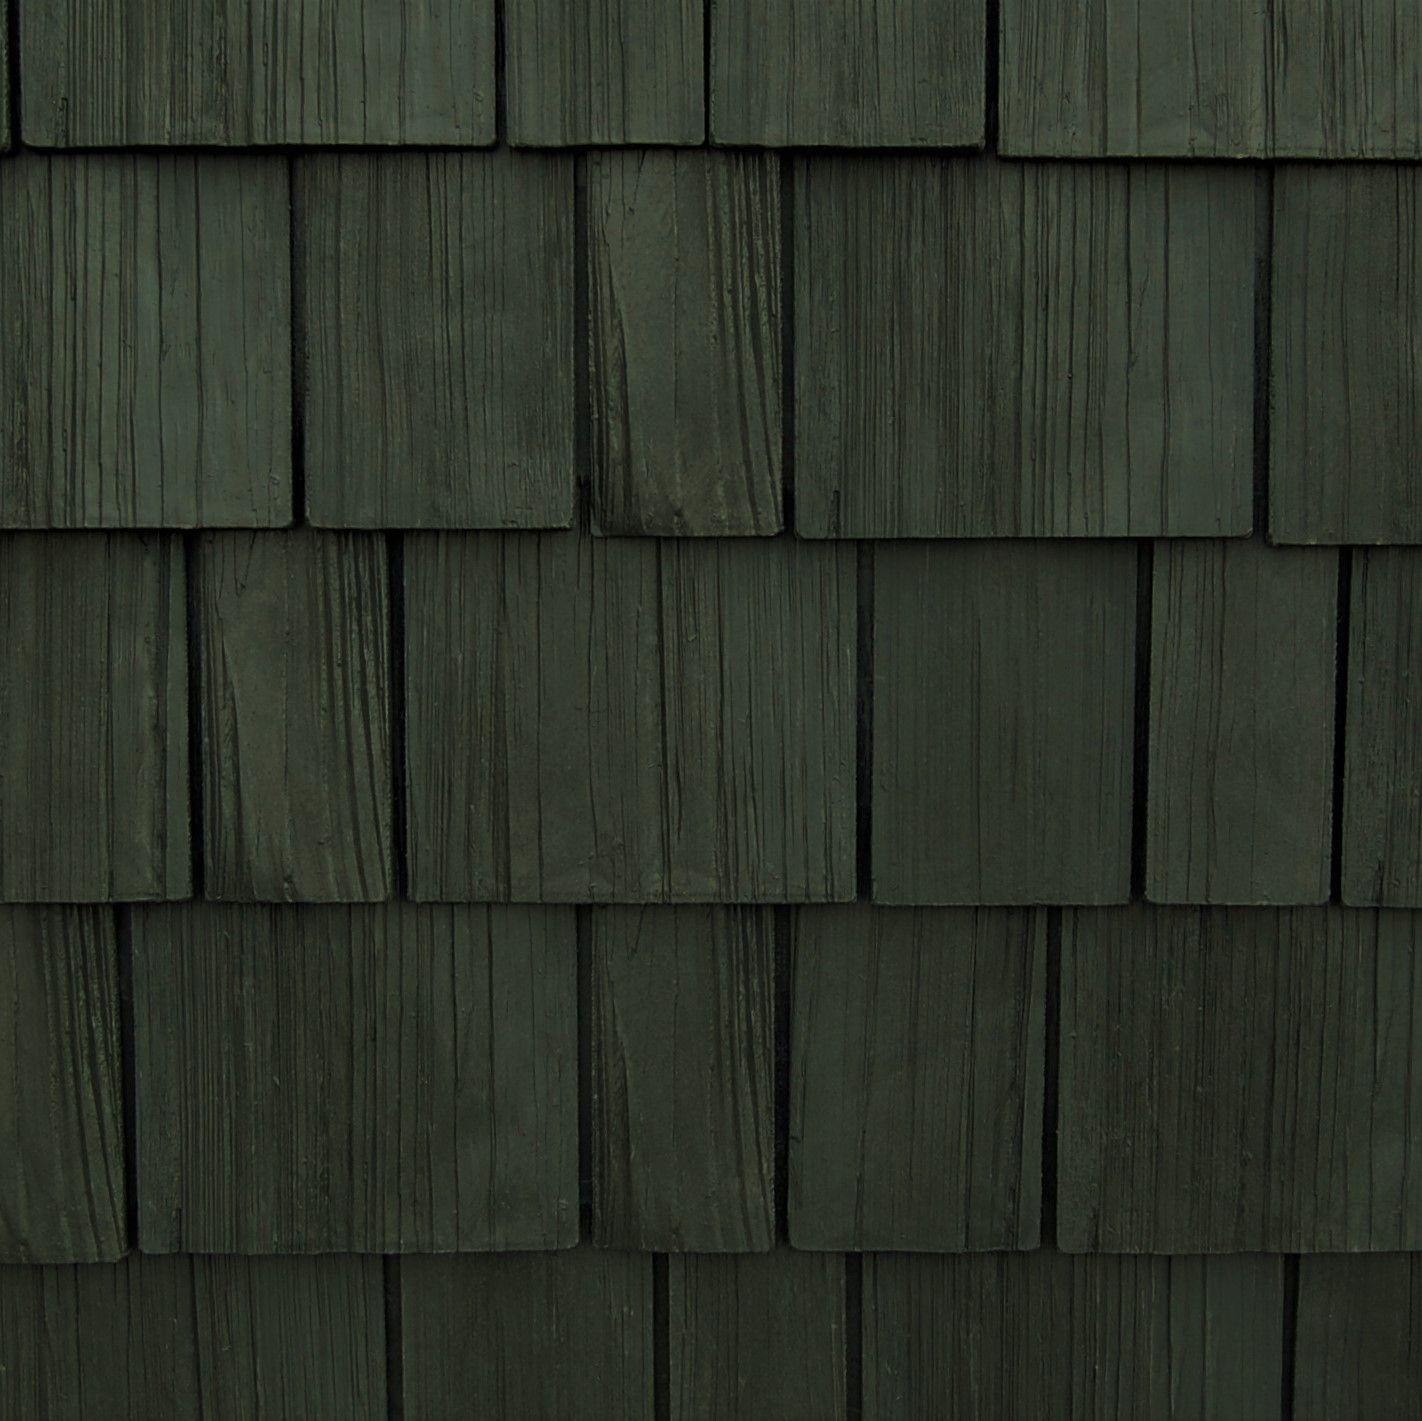 Best Weatherwood Composite Cedar Shake Shake Roof Asphalt 400 x 300